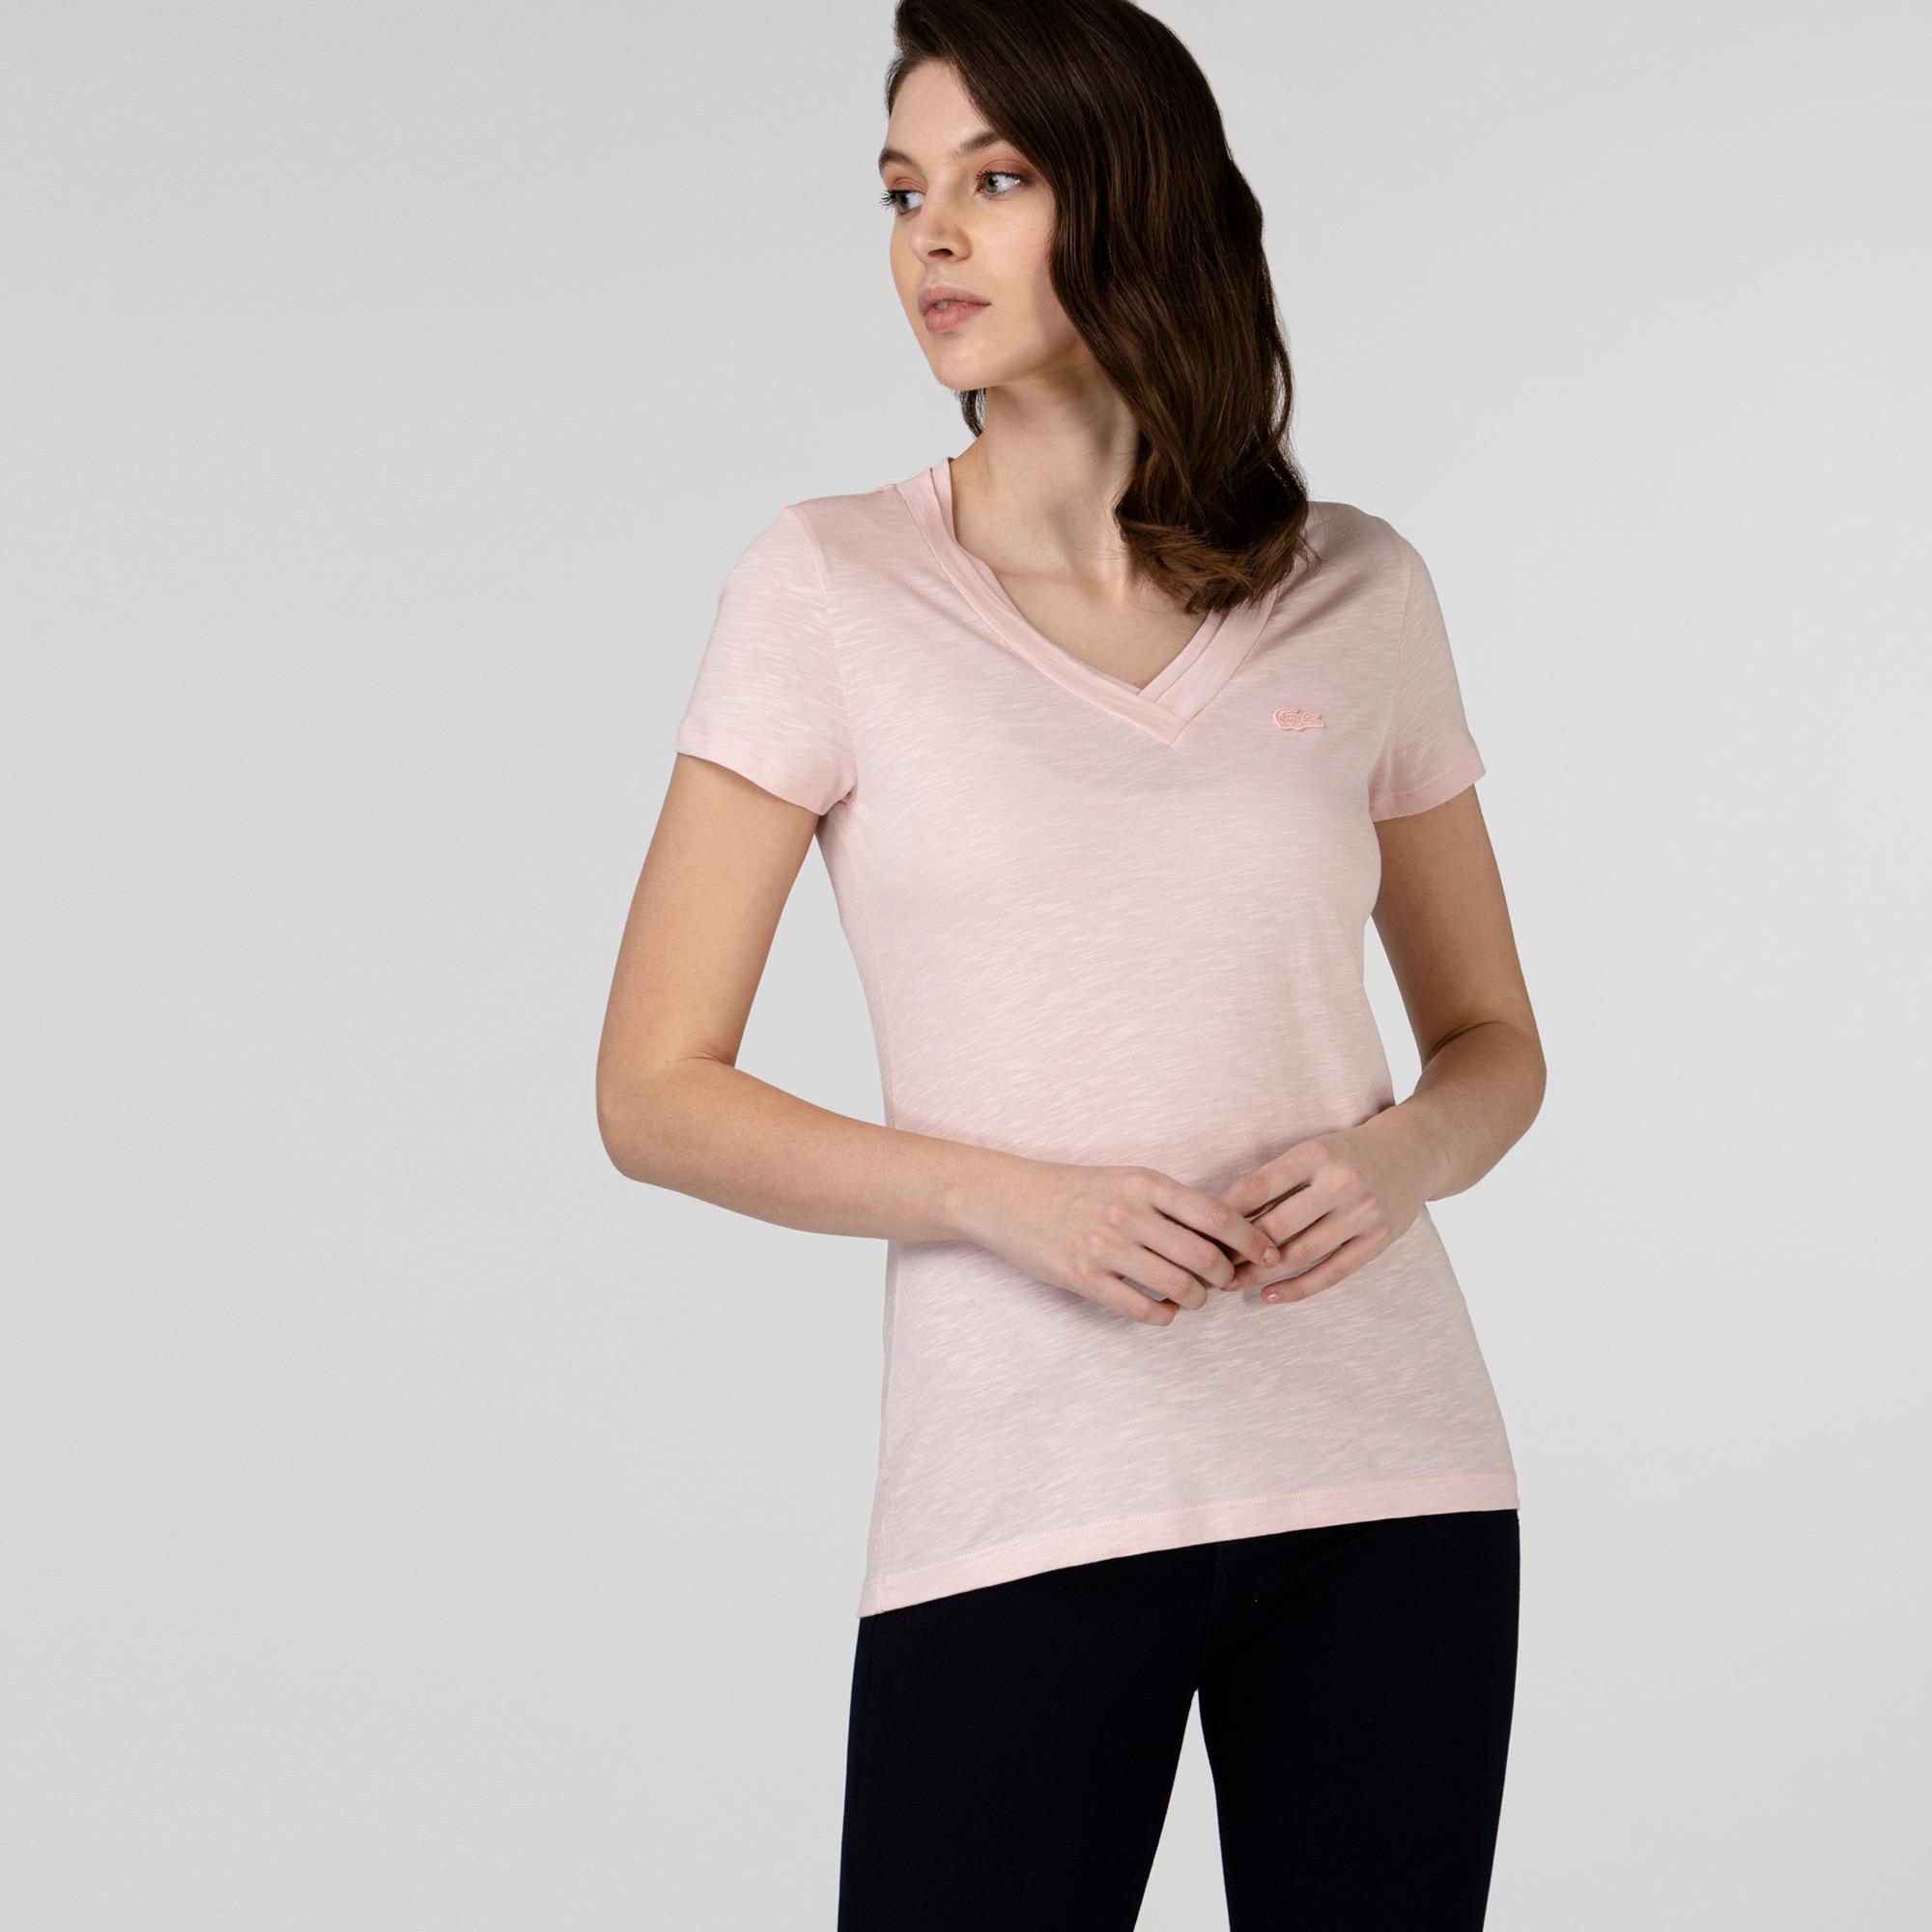 Lacoste футболка жіноча